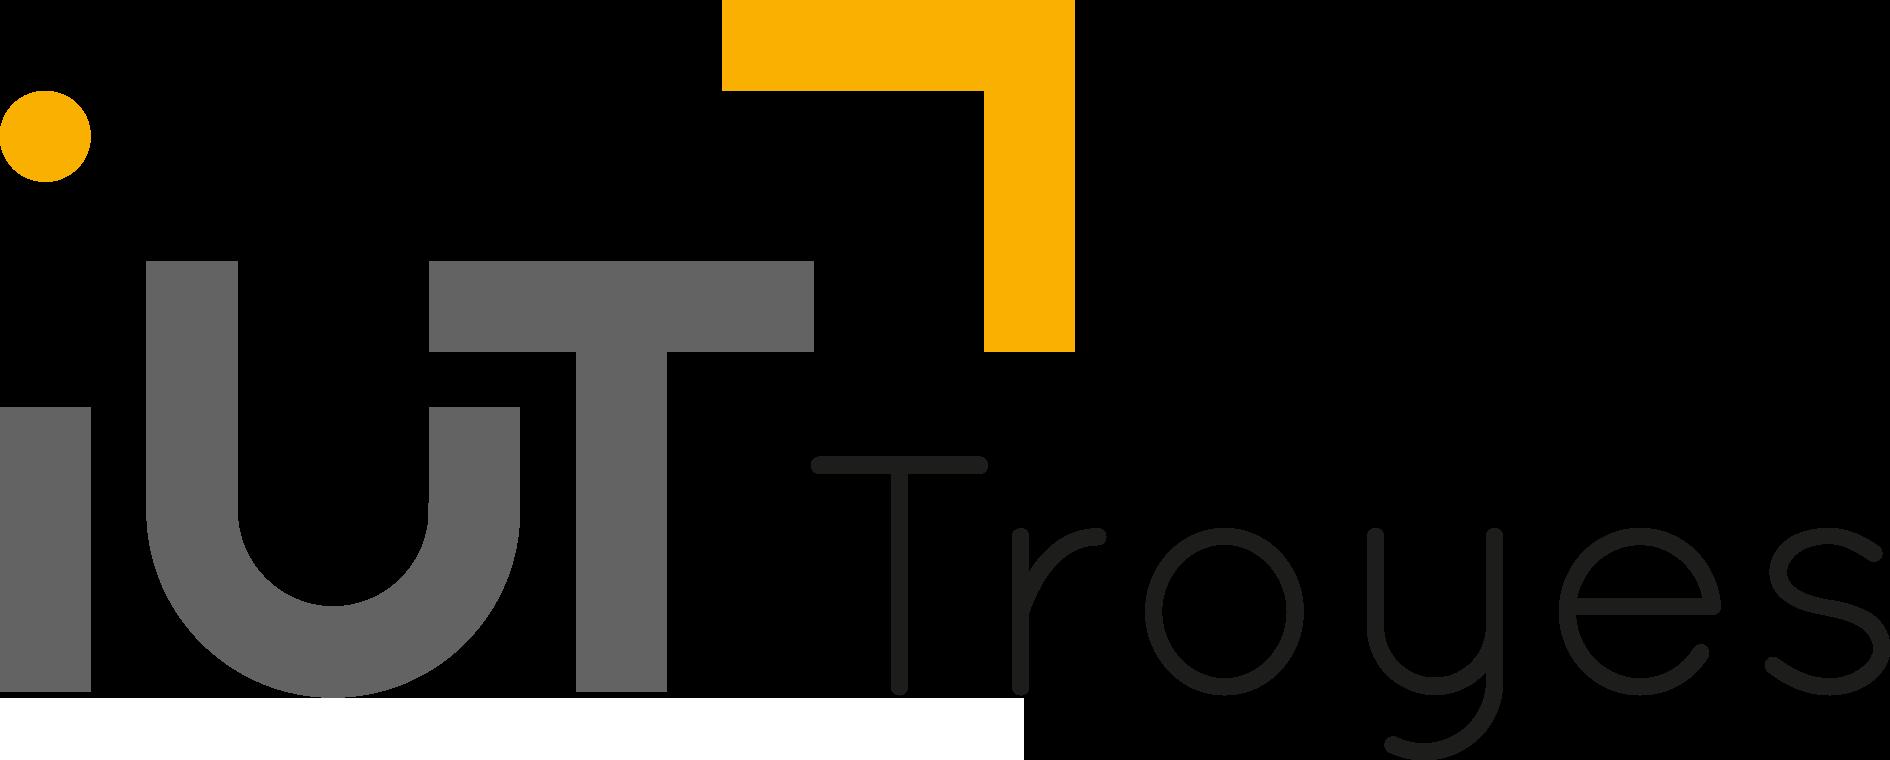 Accueil Iut De Troyes